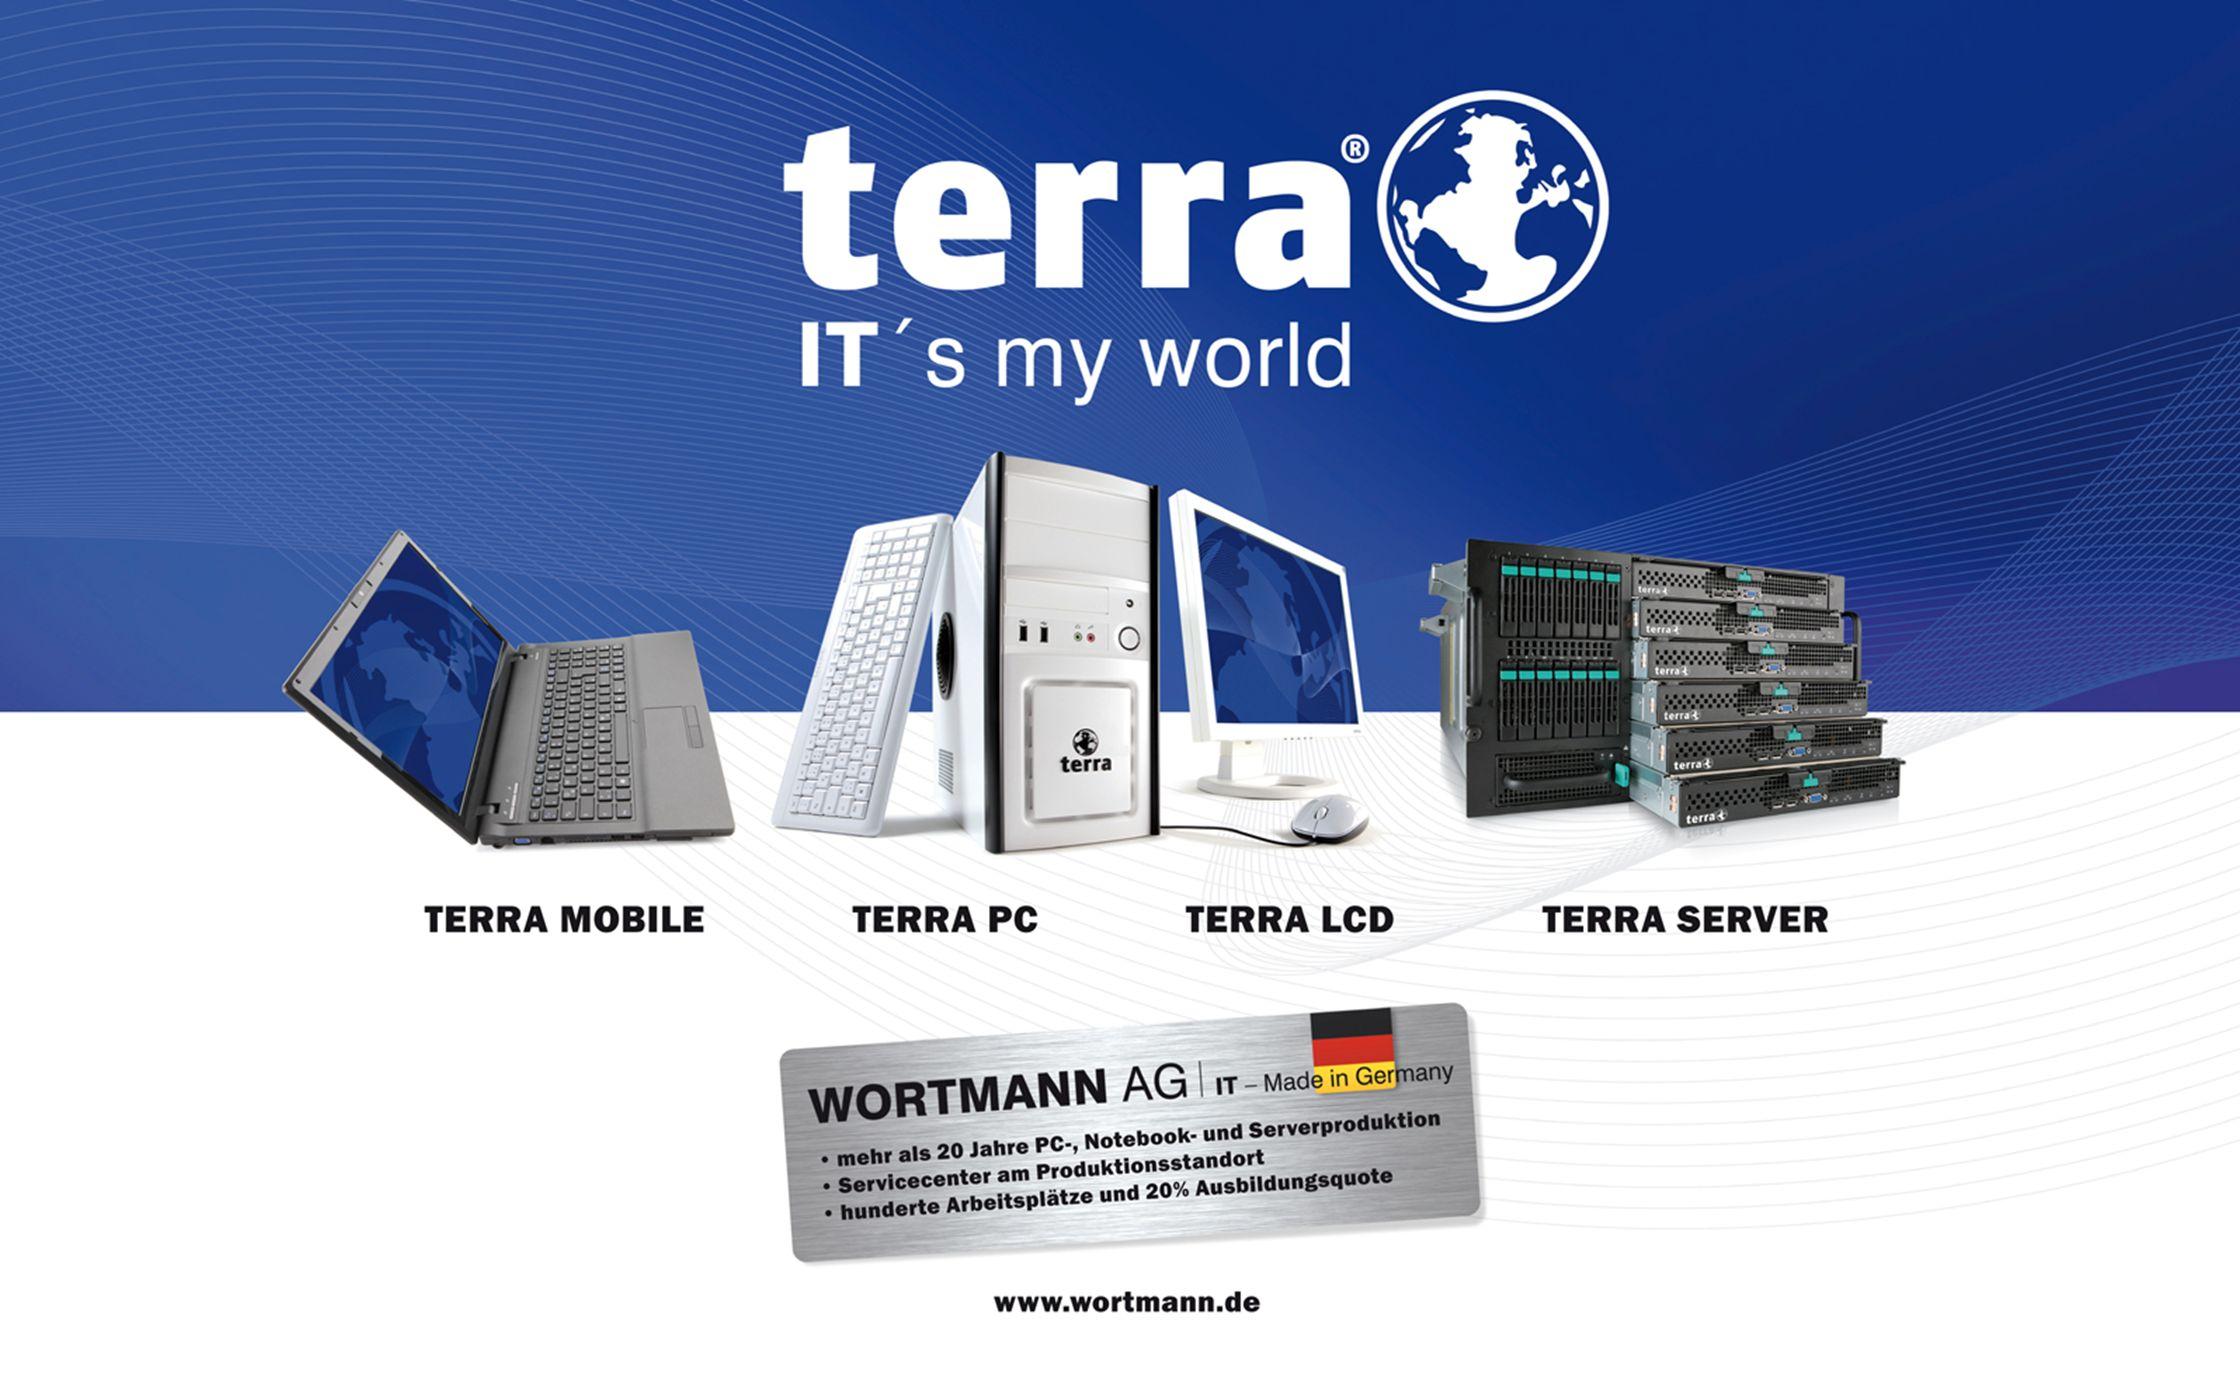 » TERRA MOBILE NETBOOKS » TERRA MOBILE HOME » TERRA MOBILE PRO » TERRA MOBILE RUGGEDIZED TERRA MOBILE MOBIL, LEISTUNGSSTARK UND AUSDAUERND MOBILE PC LCD SERVER STORAGE FIREWALL THINCLIENT SERVICE